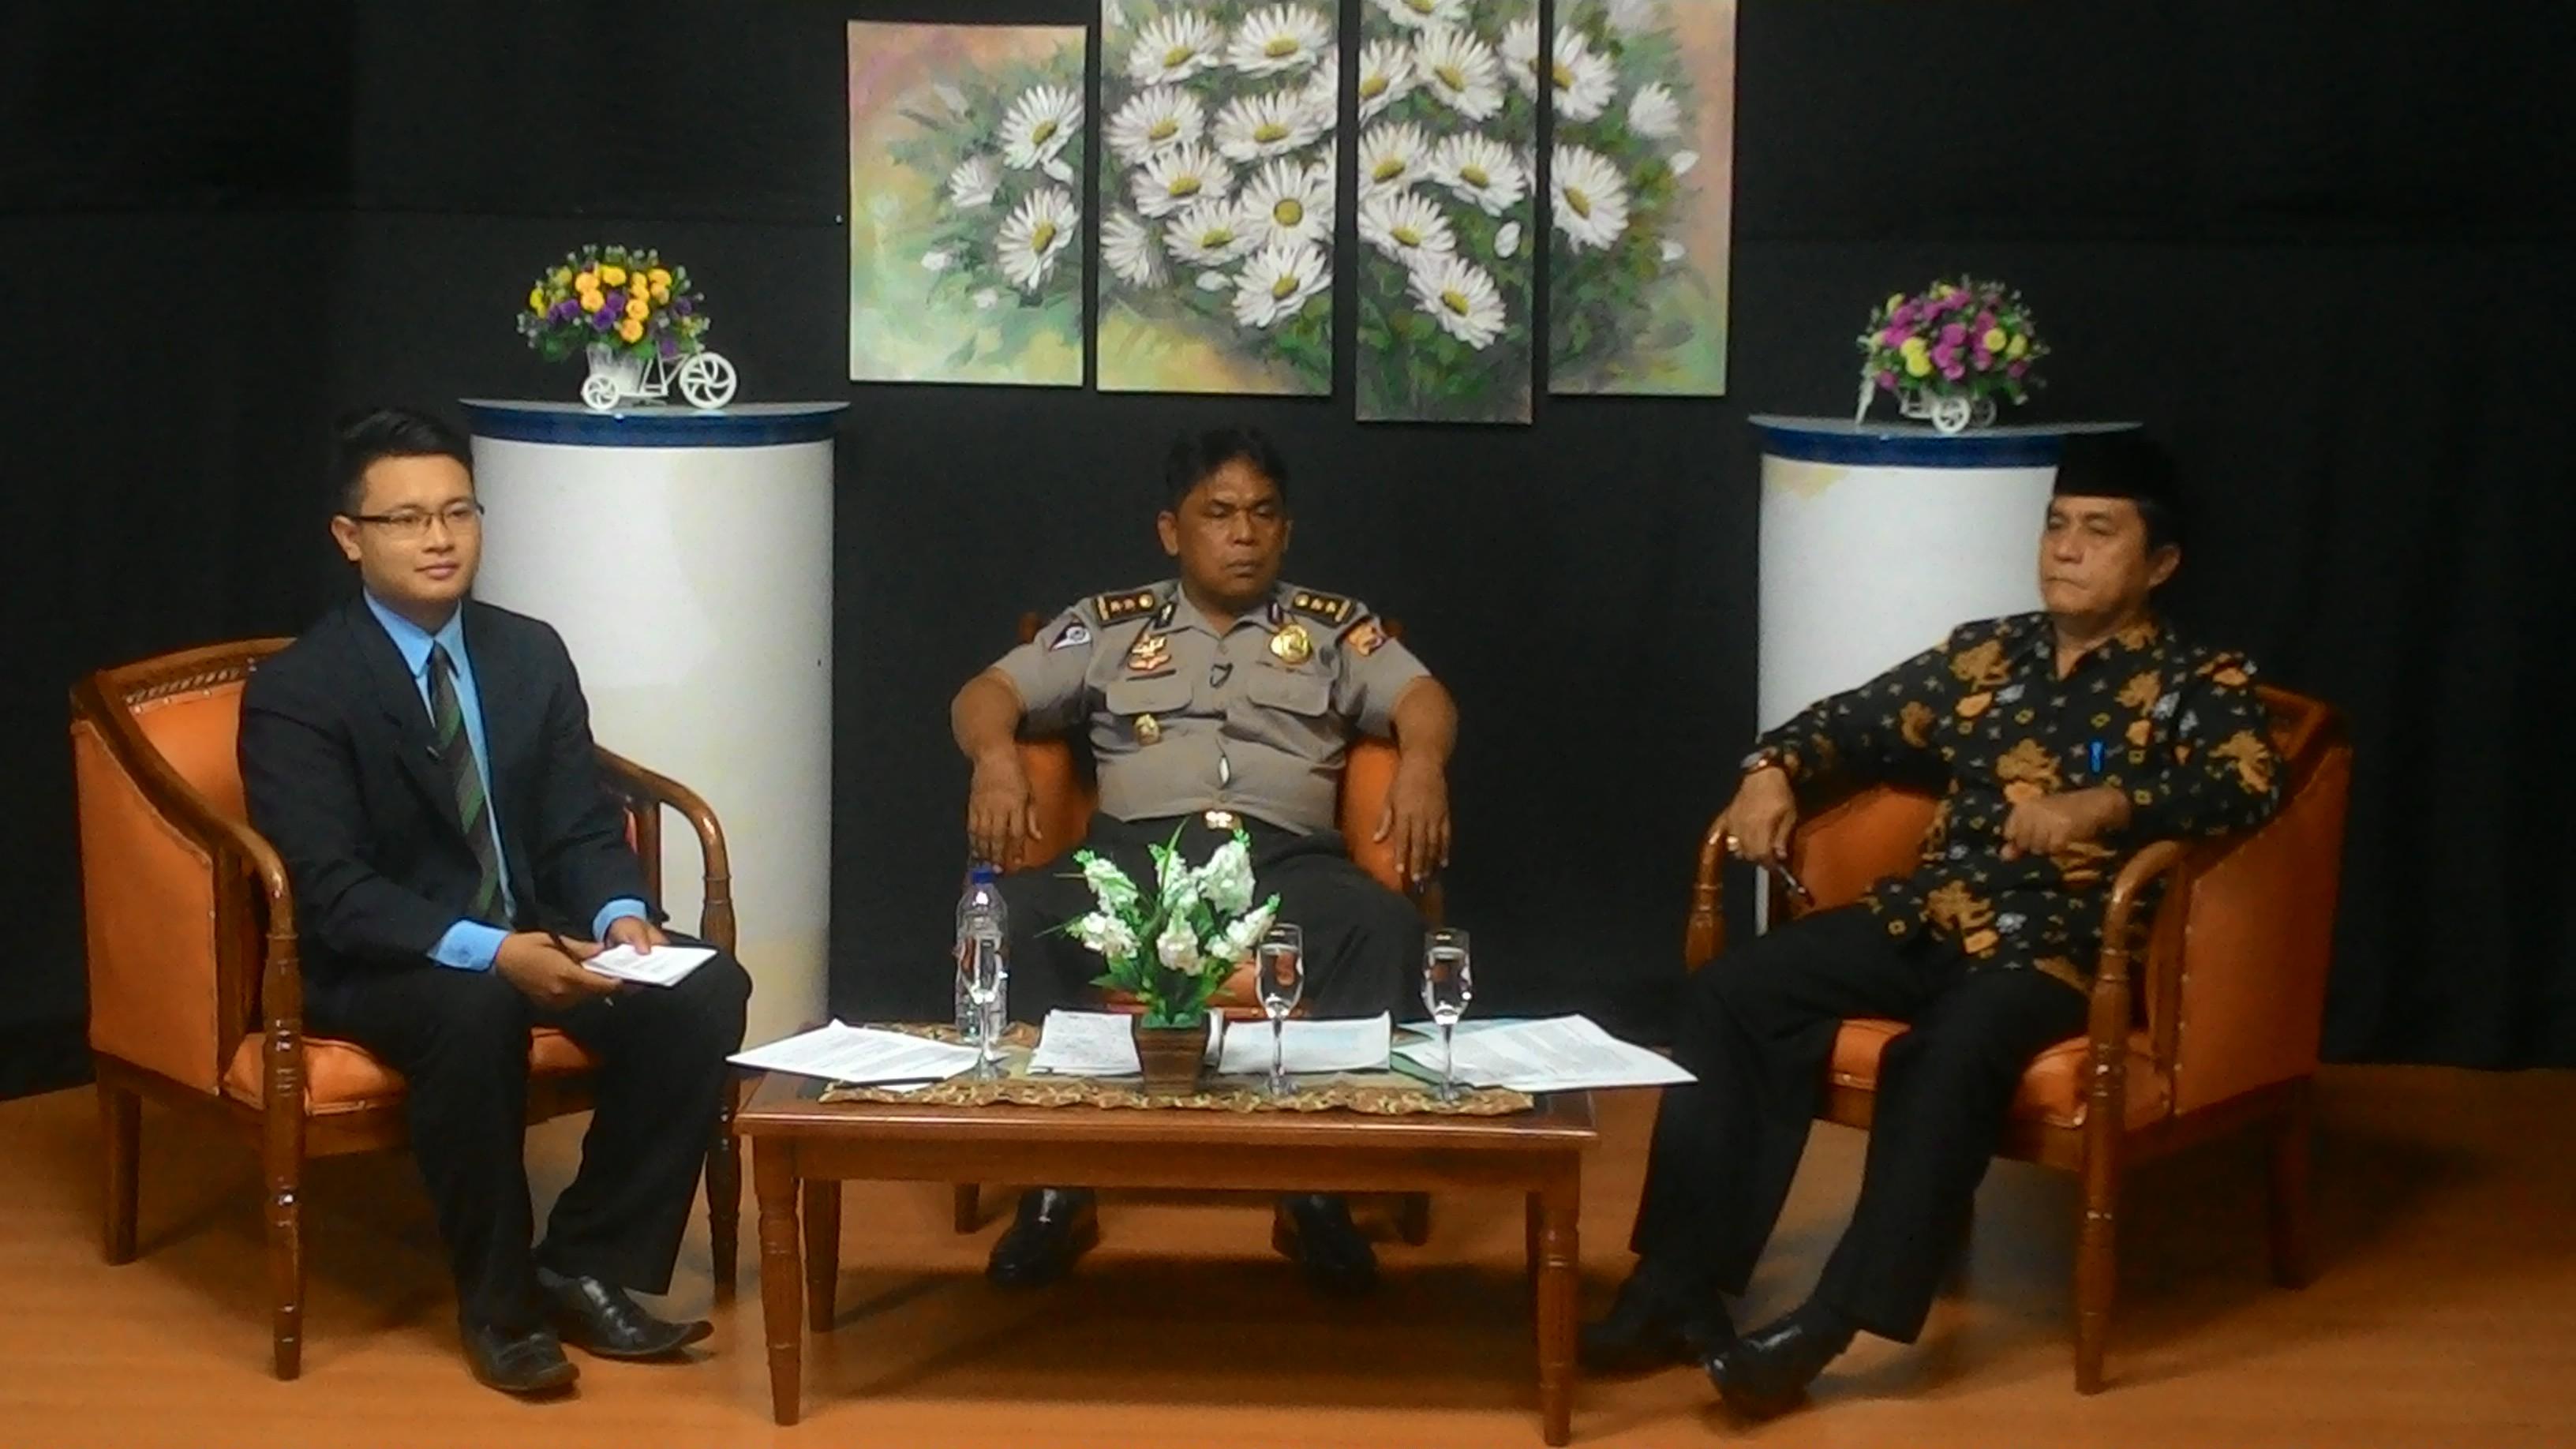 Mencegah dan mengantisipasi perkembangan paham radikal di Bengkulu